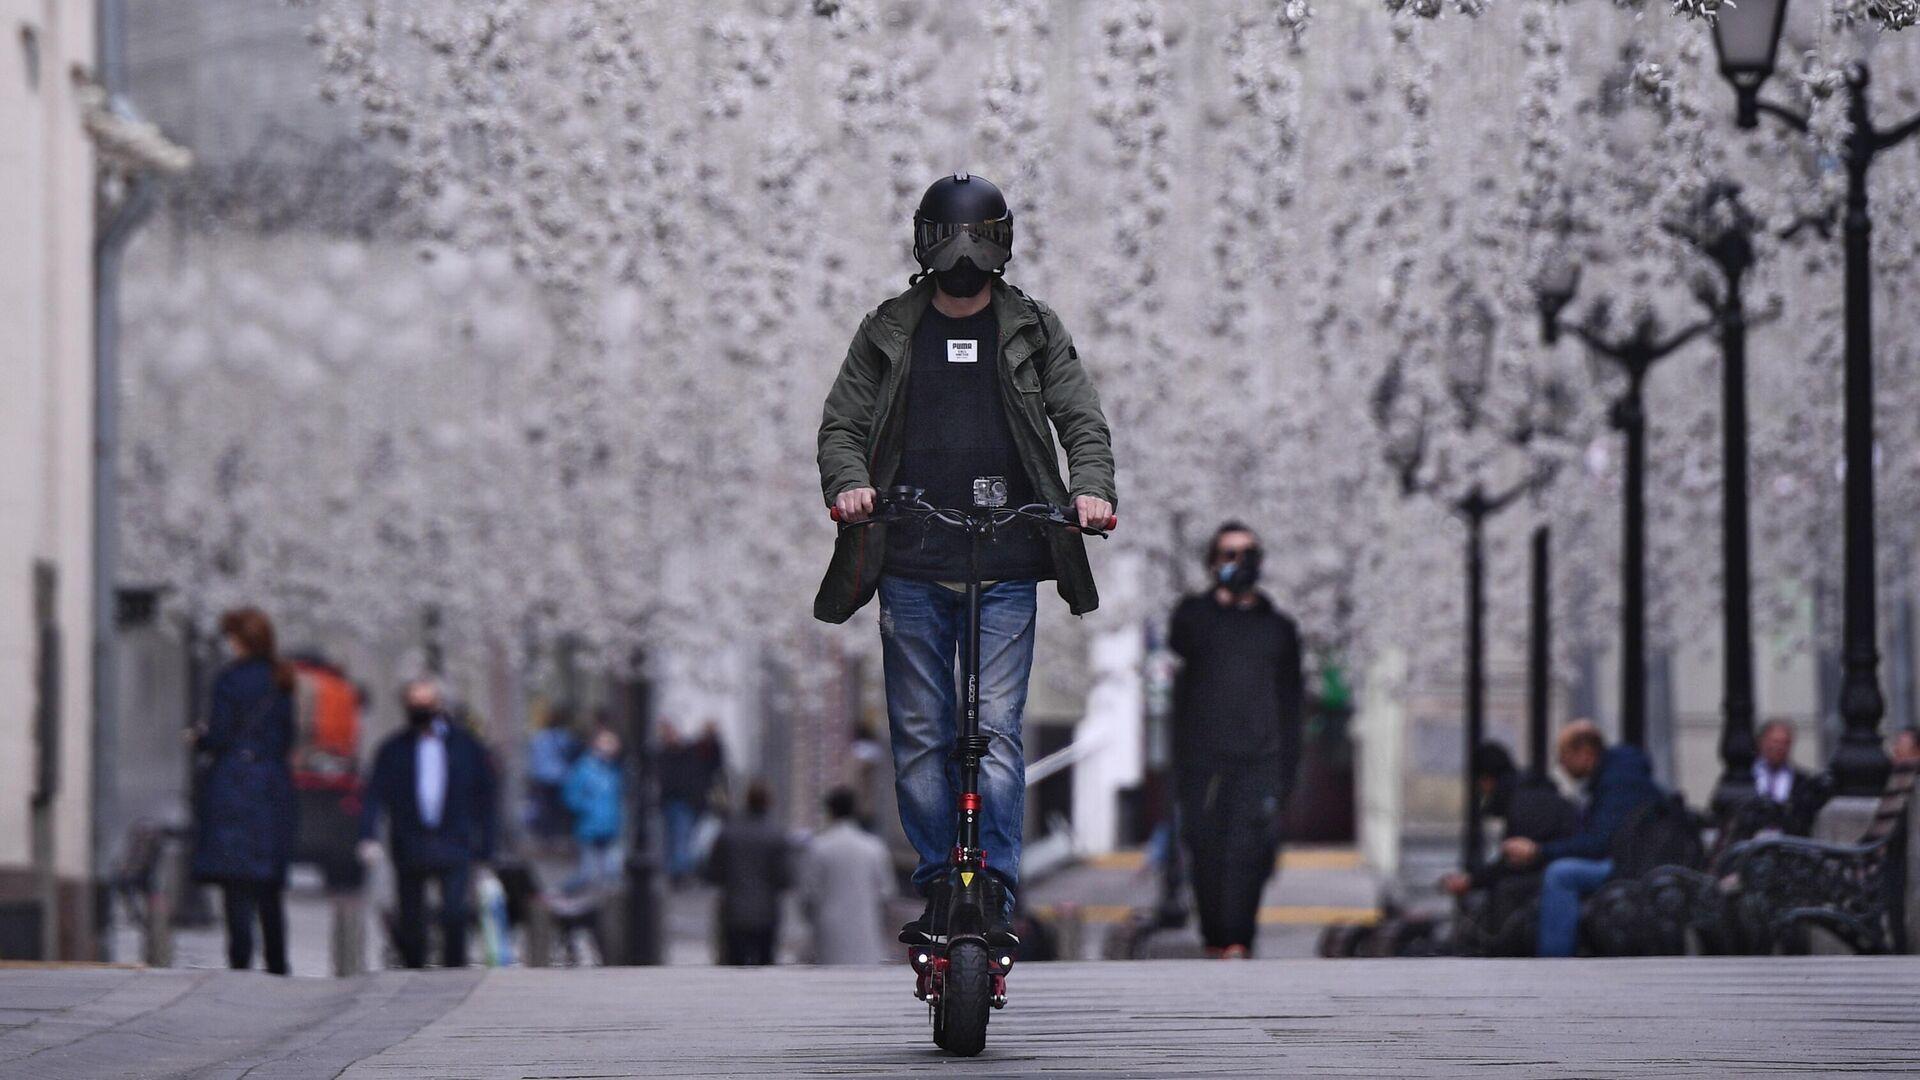 Мужчина в защитном шлеме катается на электросамокате - РИА Новости, 1920, 29.10.2020